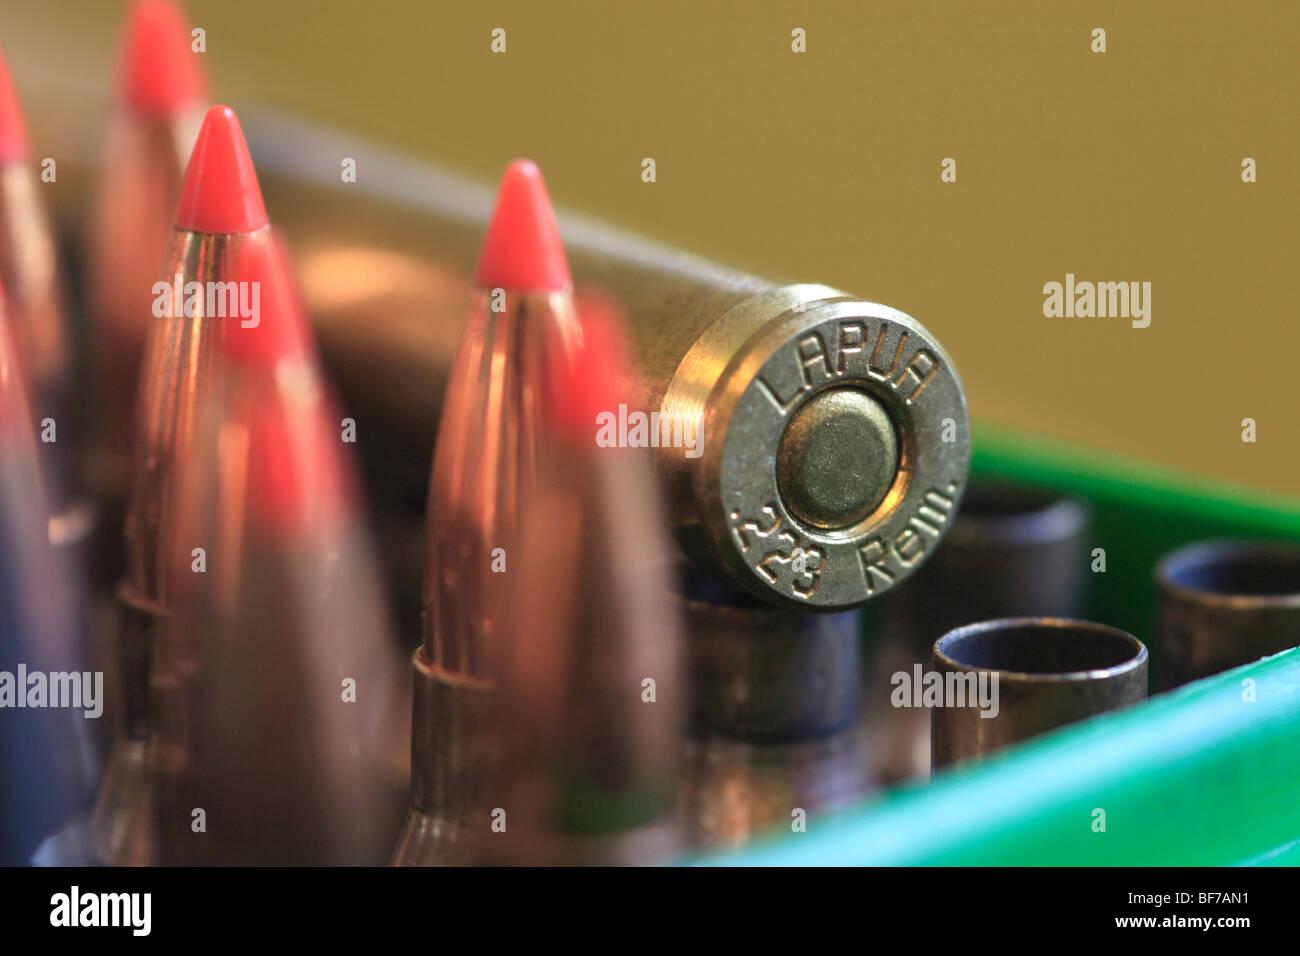 .223 Ballistic Tip Ammunition - Stock Image